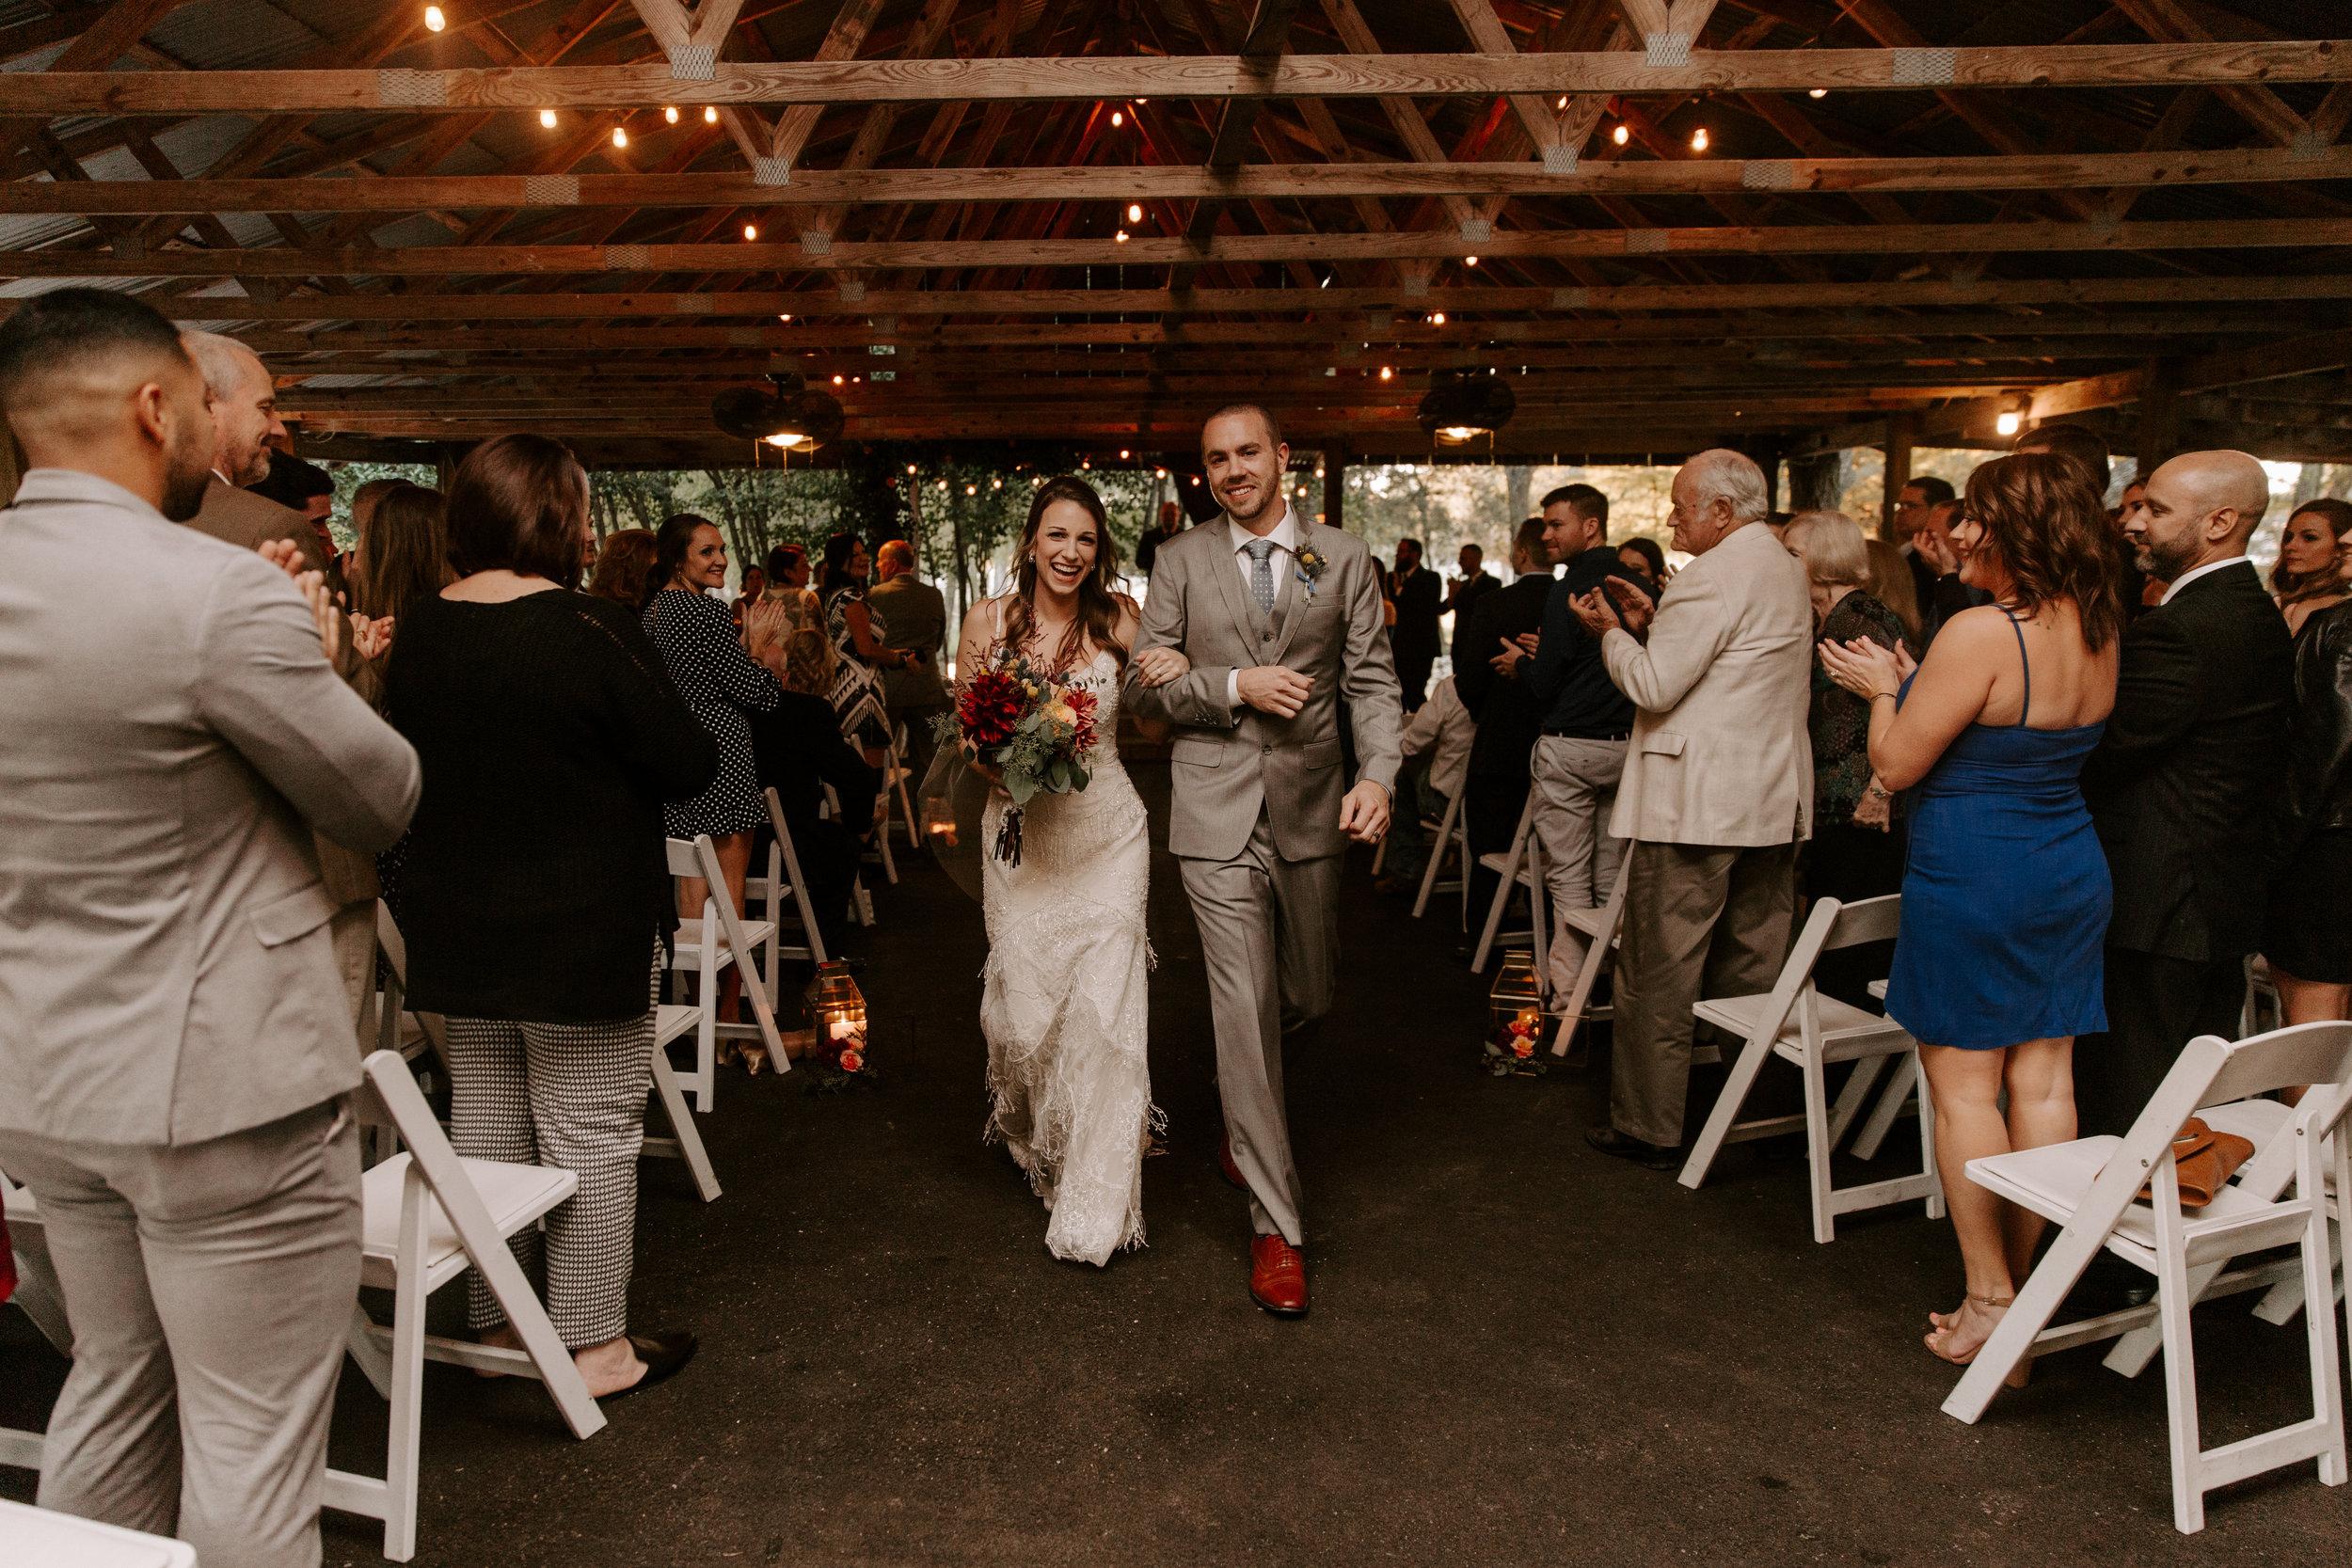 Worley Wedding - Arden and Eric - Wedding Photos - Sneak Peek -Meme Urbane Photography_-15.jpg